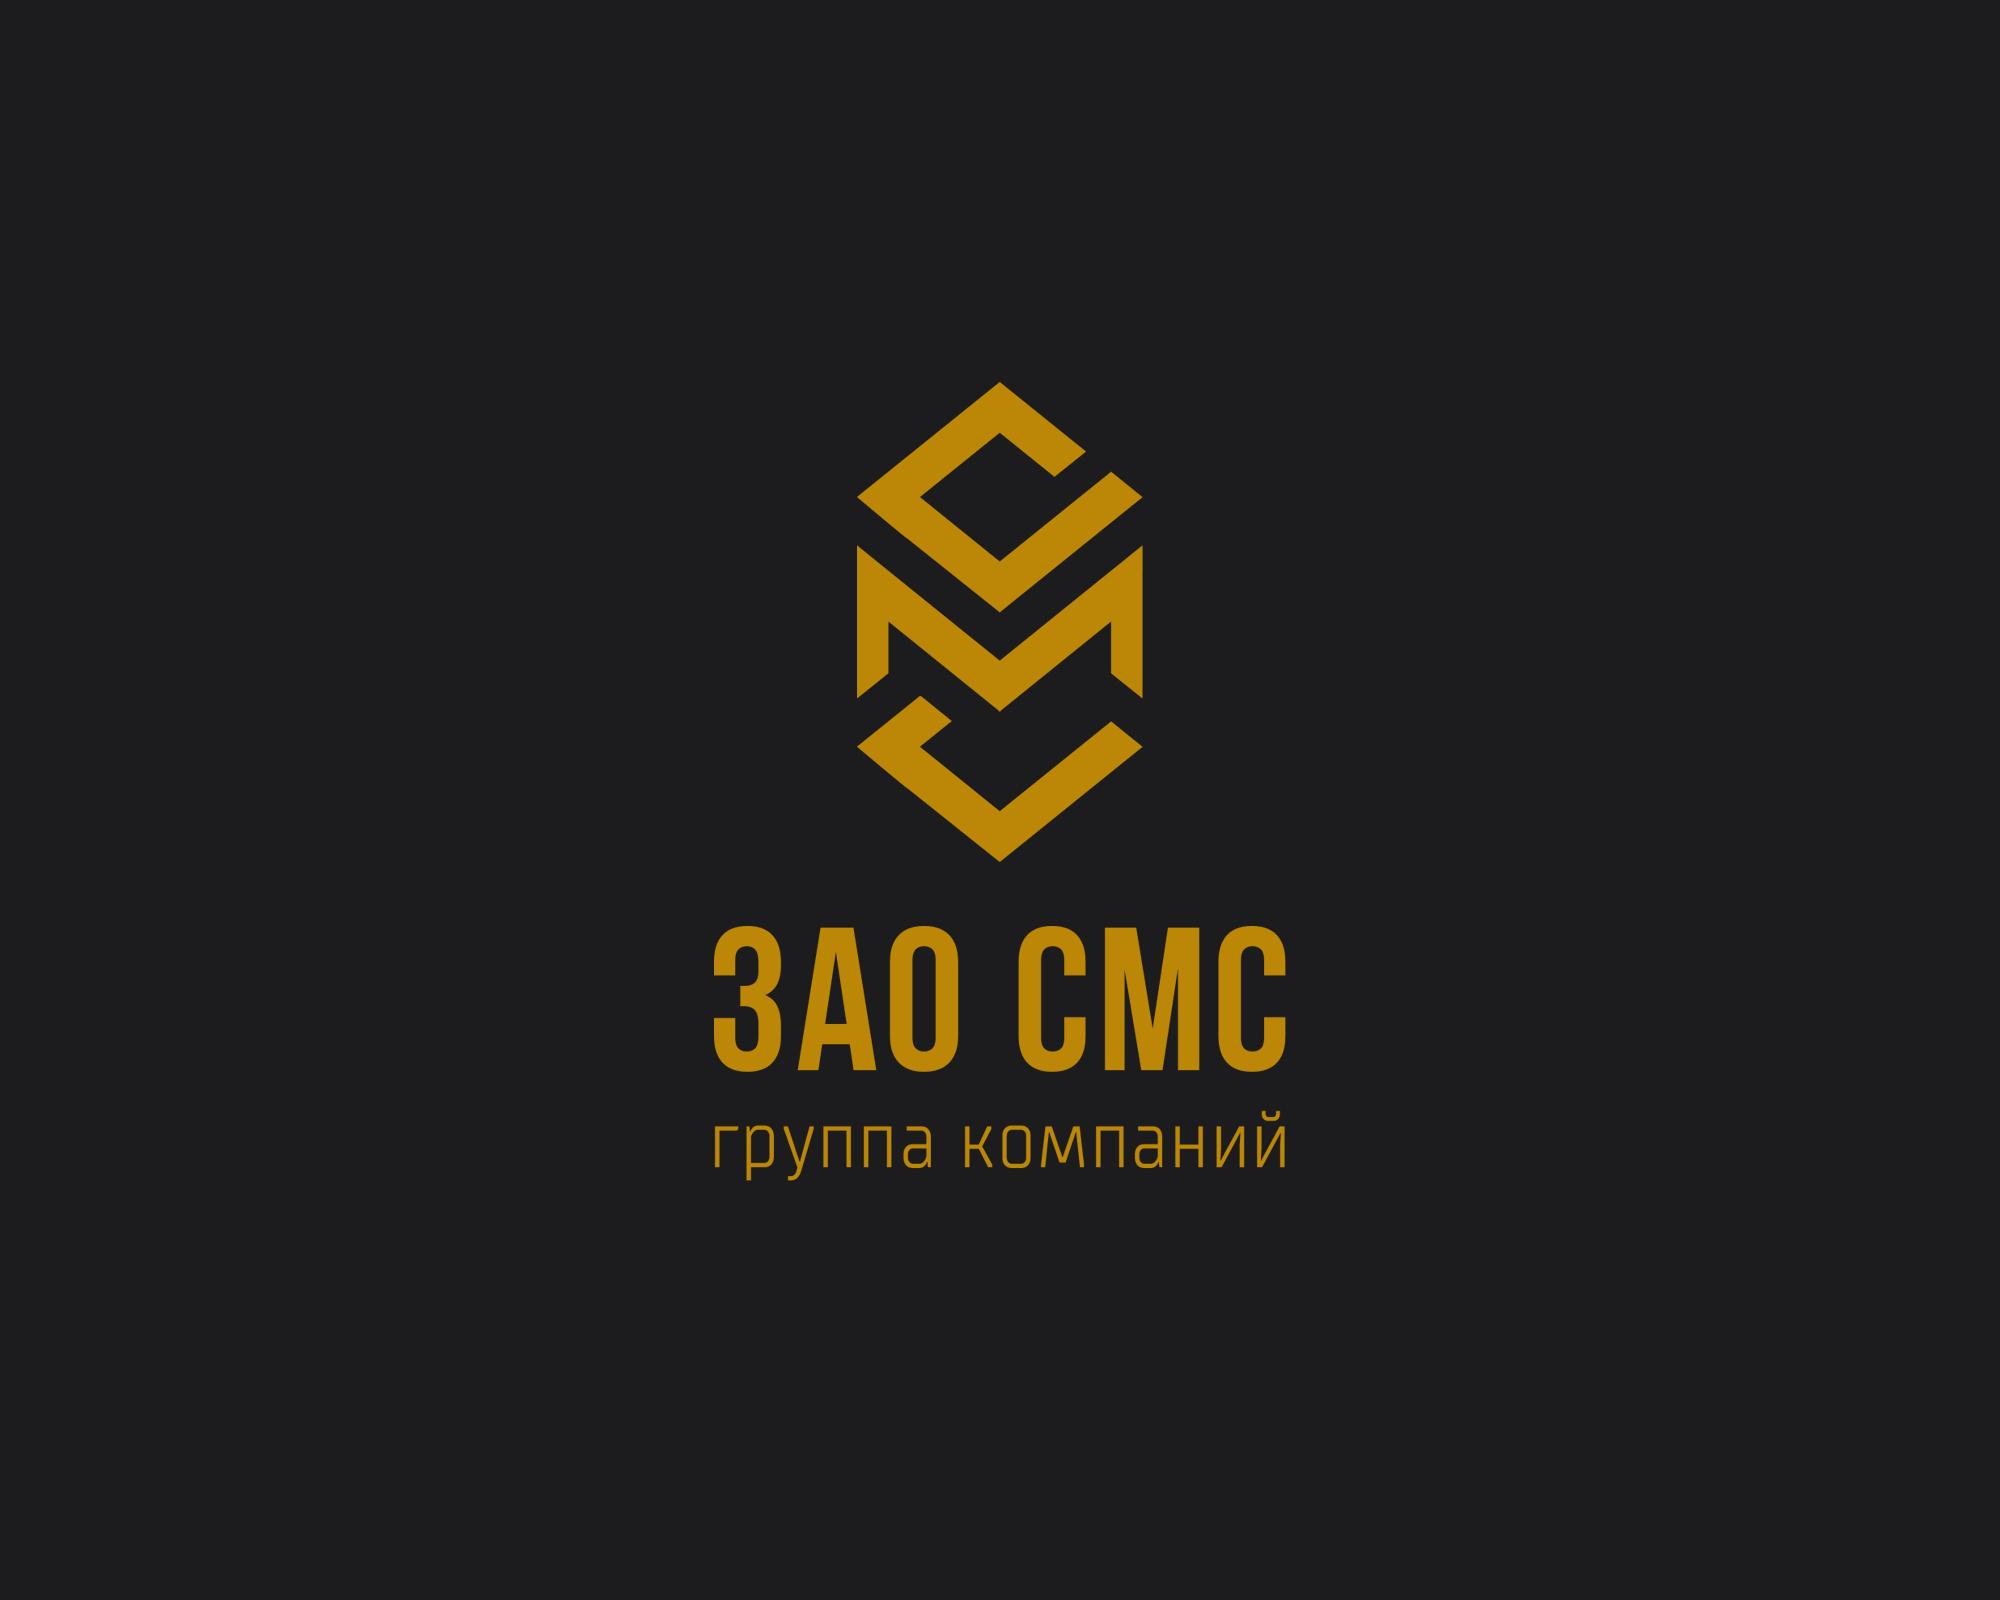 Дизайнер для разработки Логотипа для организации !СРОЧНО! фото f_9995a2abb4586649.jpg